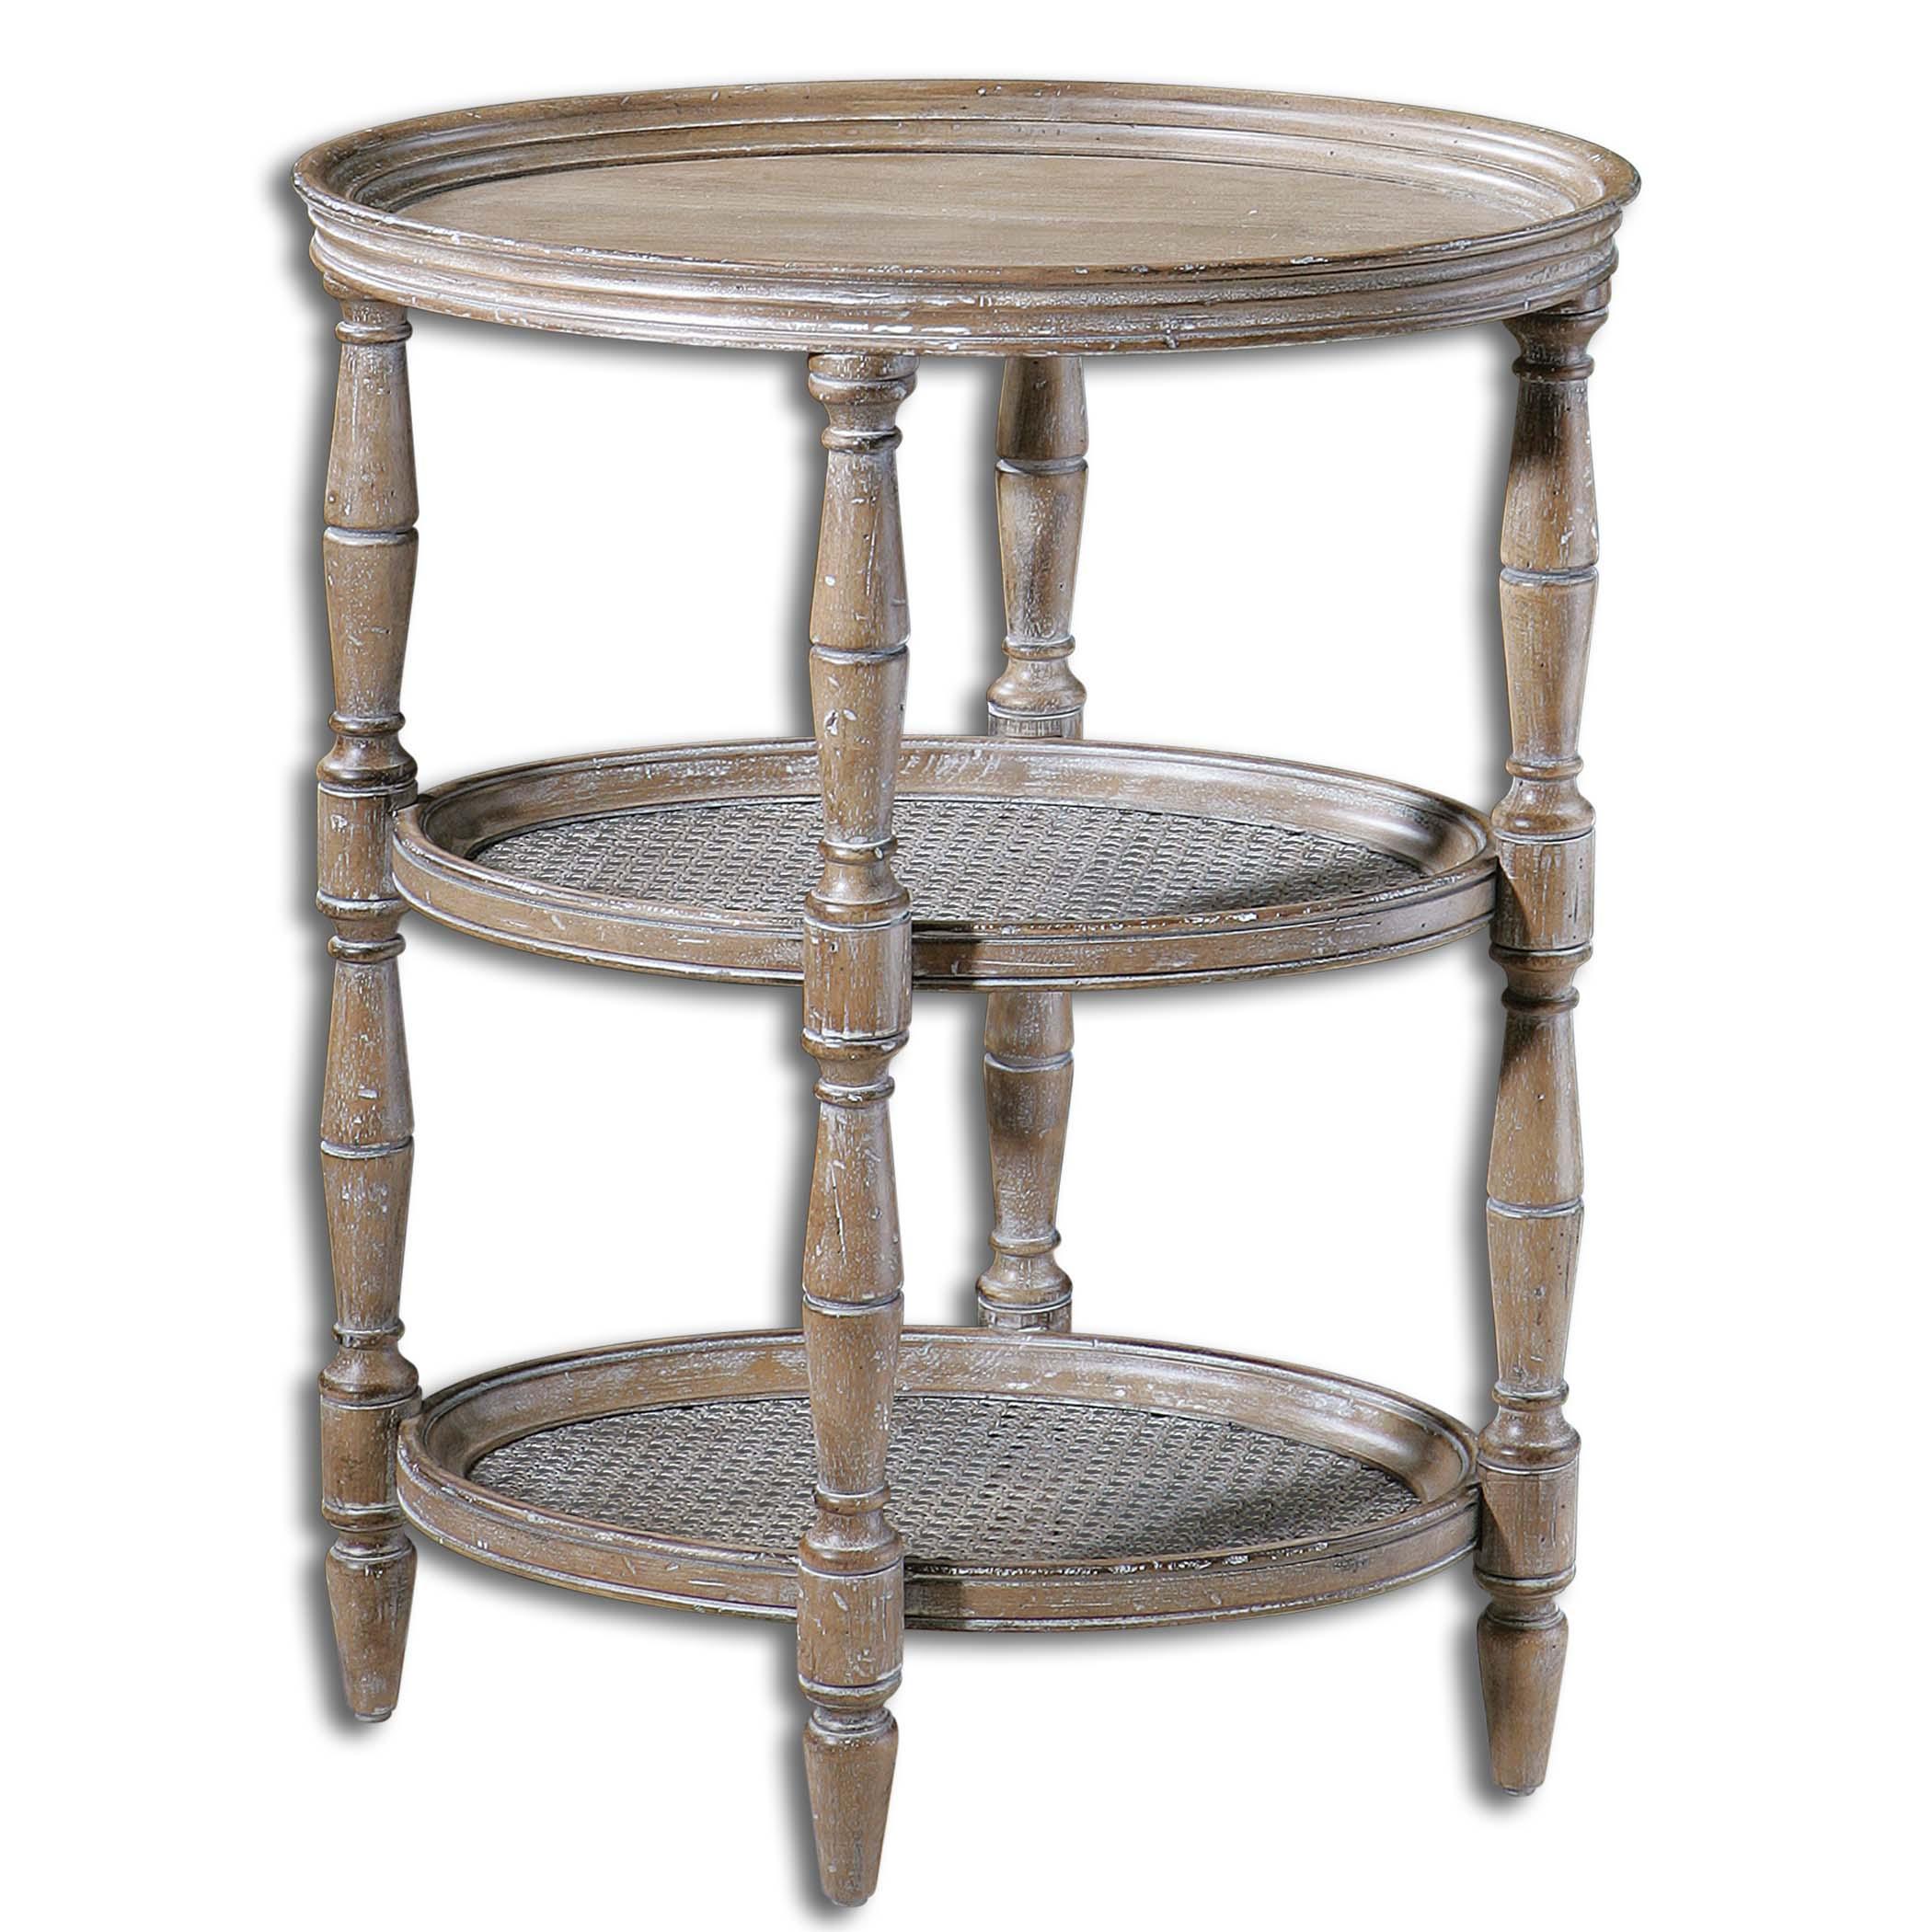 Uttermost Accent Furniture Kendellen Antique Accent Table - Item Number: 24311